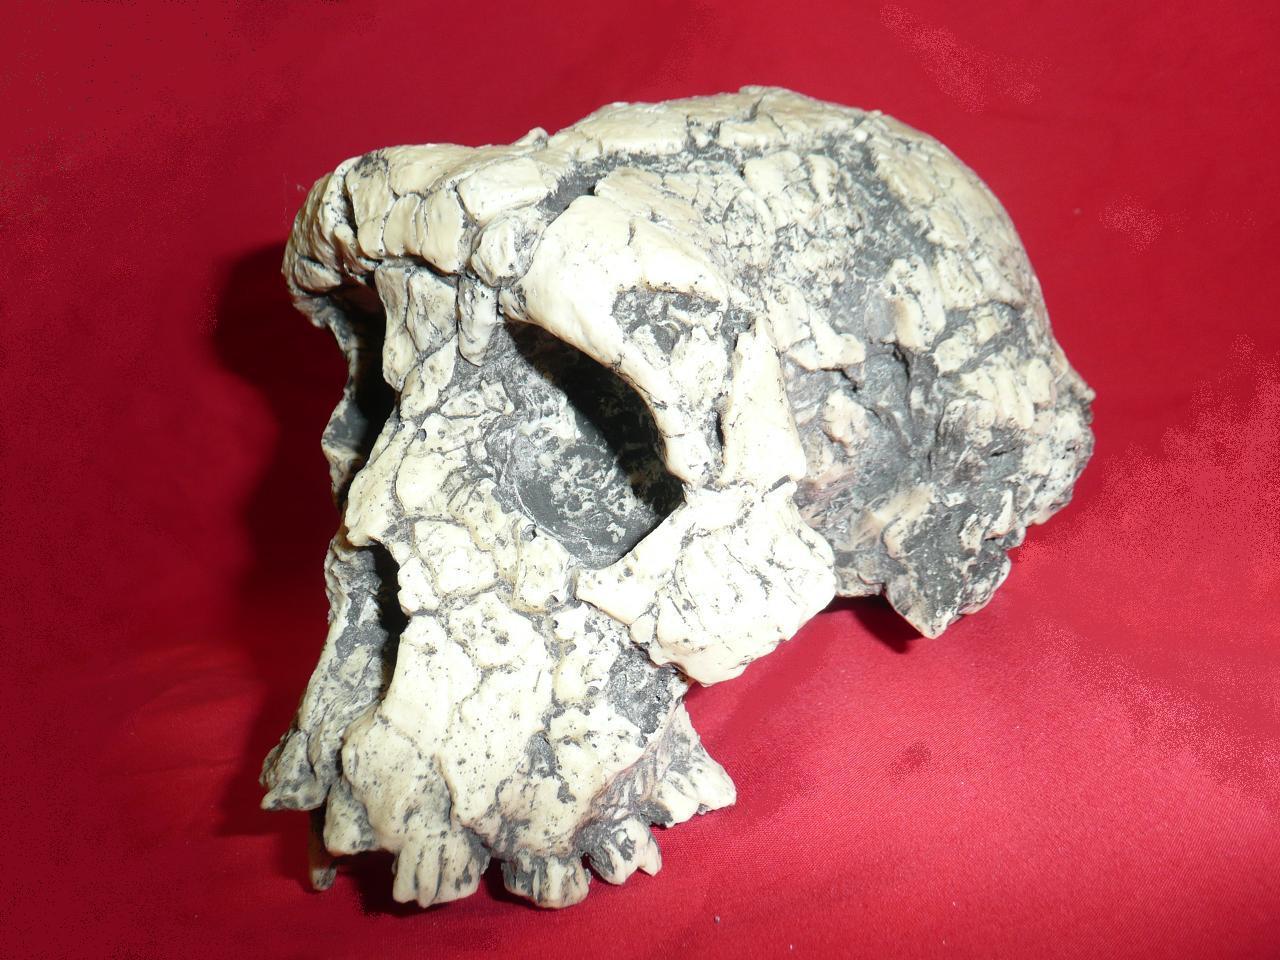 Le crâne de ToumaïPhoto: commons.wikimedia.org